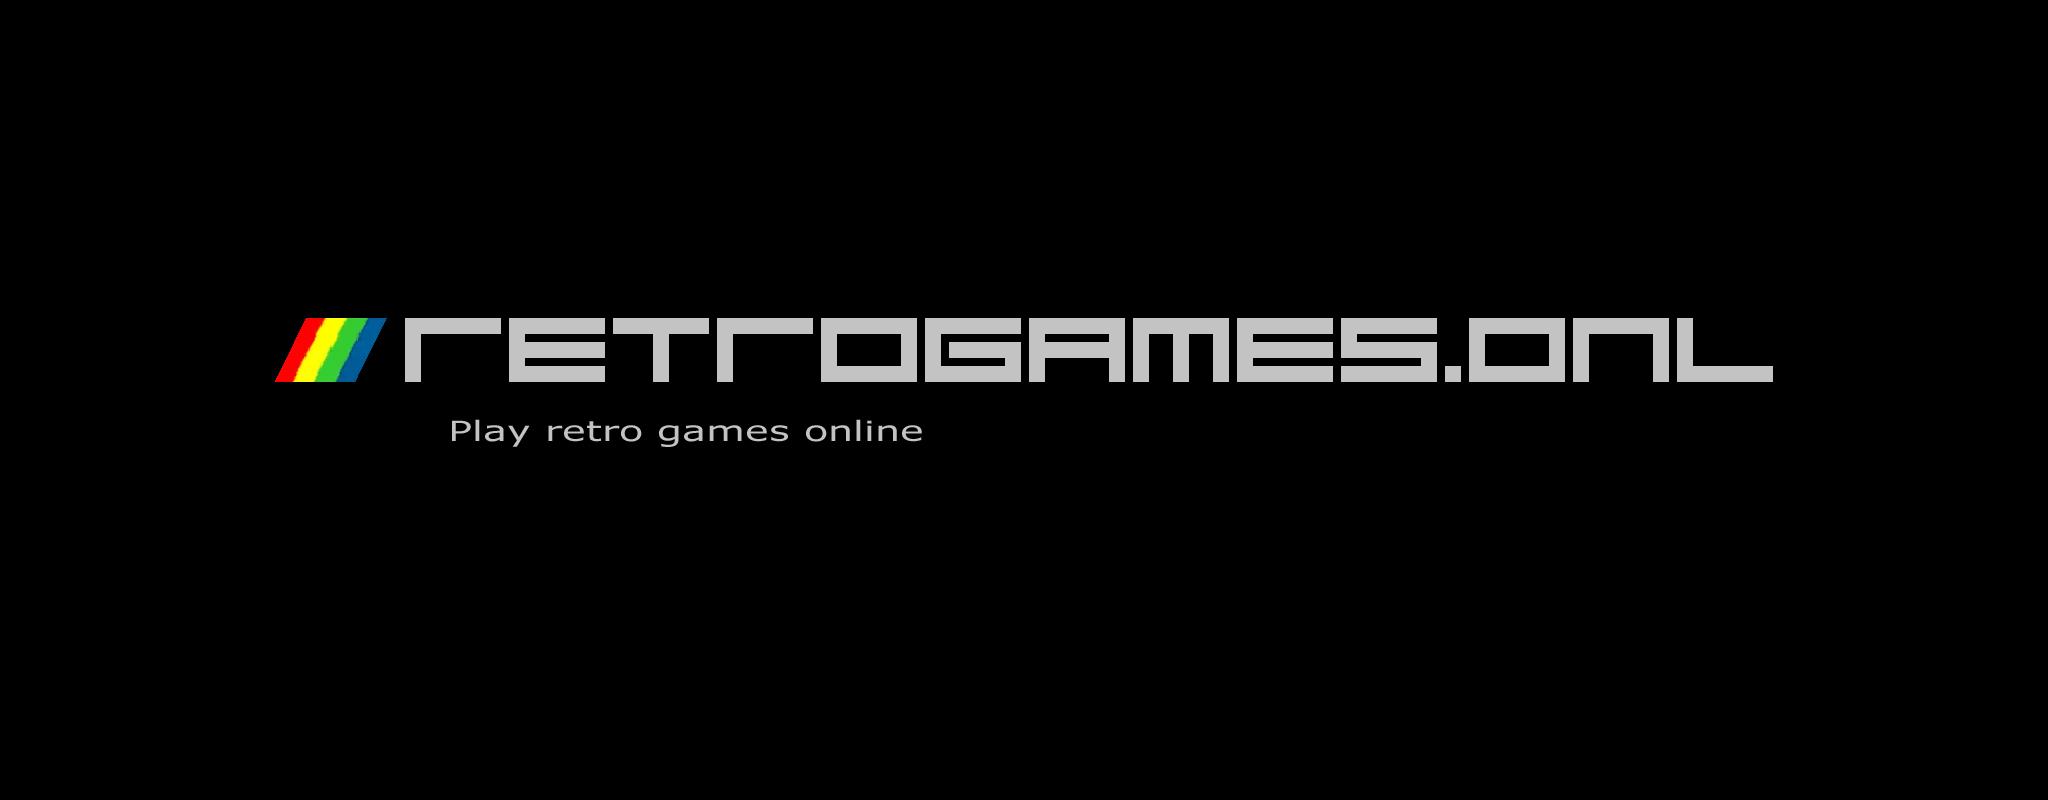 Play online PlayStation, 3DO, Nintendo, SEGA, Atari, Neo-Geo, Arcade, TurboGrafx-16, MSX, retro games